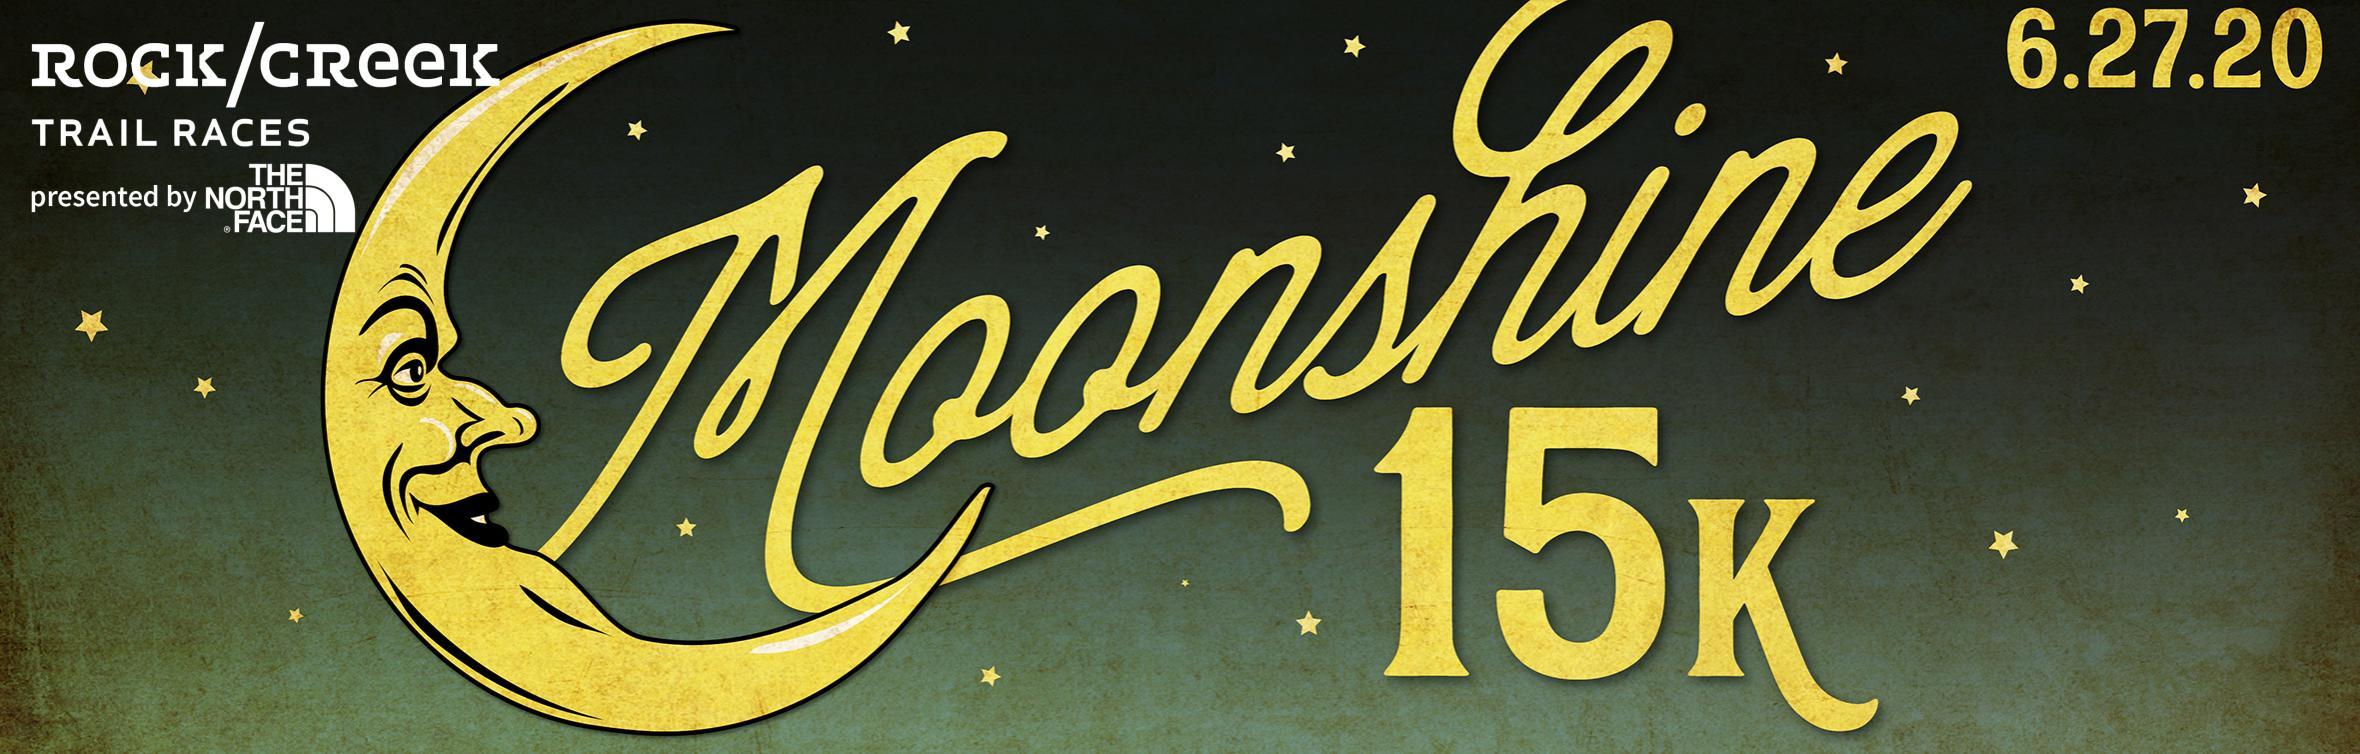 Moonshine 15K 6.27.20